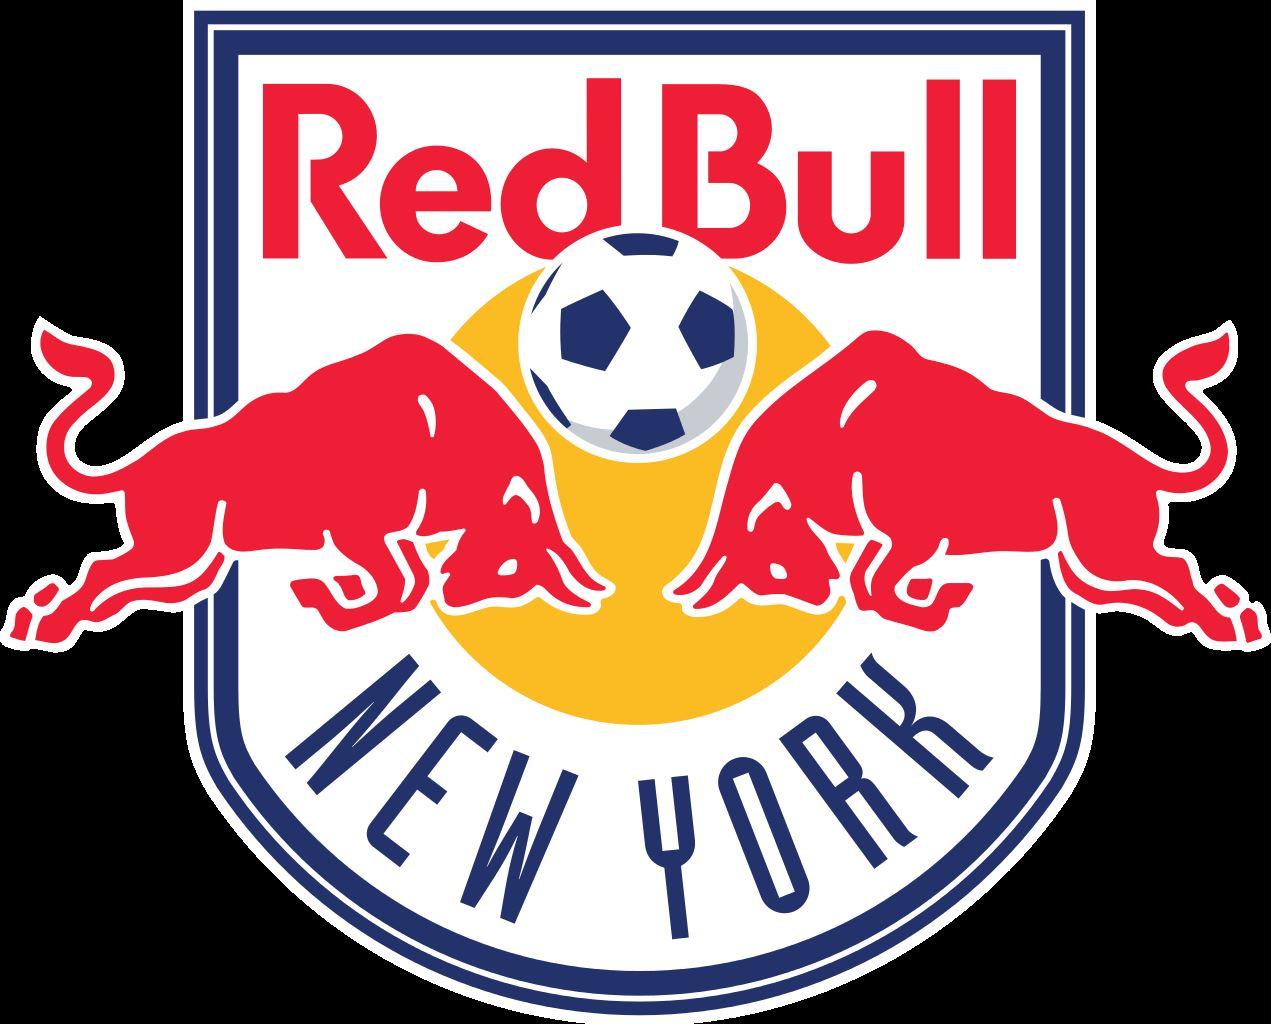 New York Red Bulls - NYRB